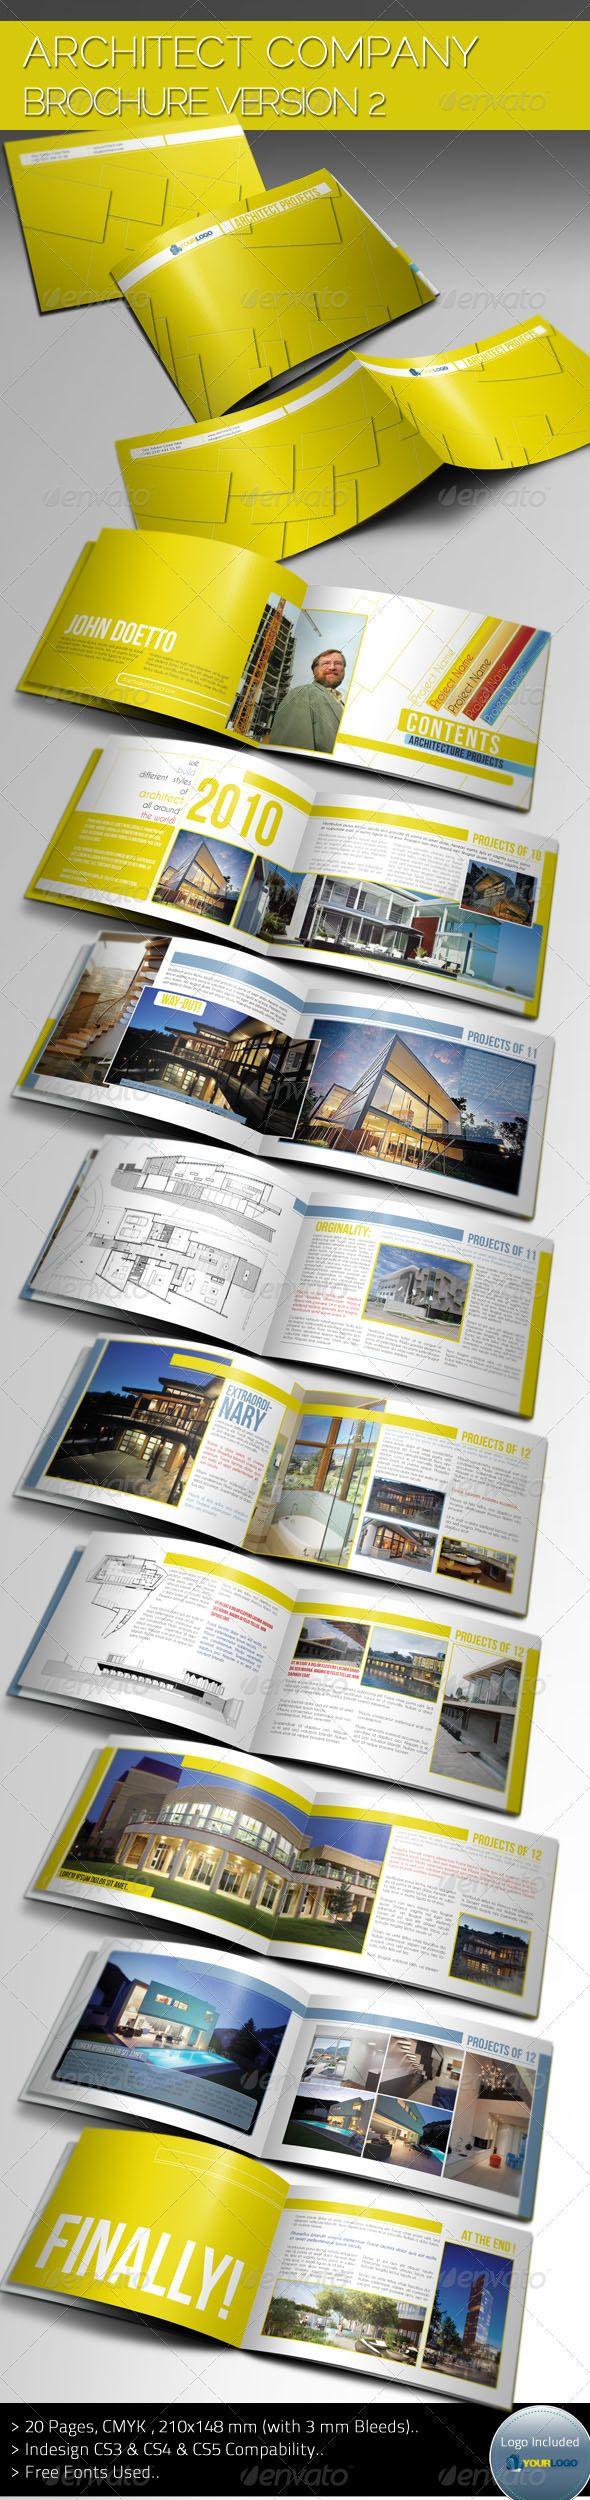 architecture brochure design pdf - best 25 architecture portfolio pdf ideas on pinterest